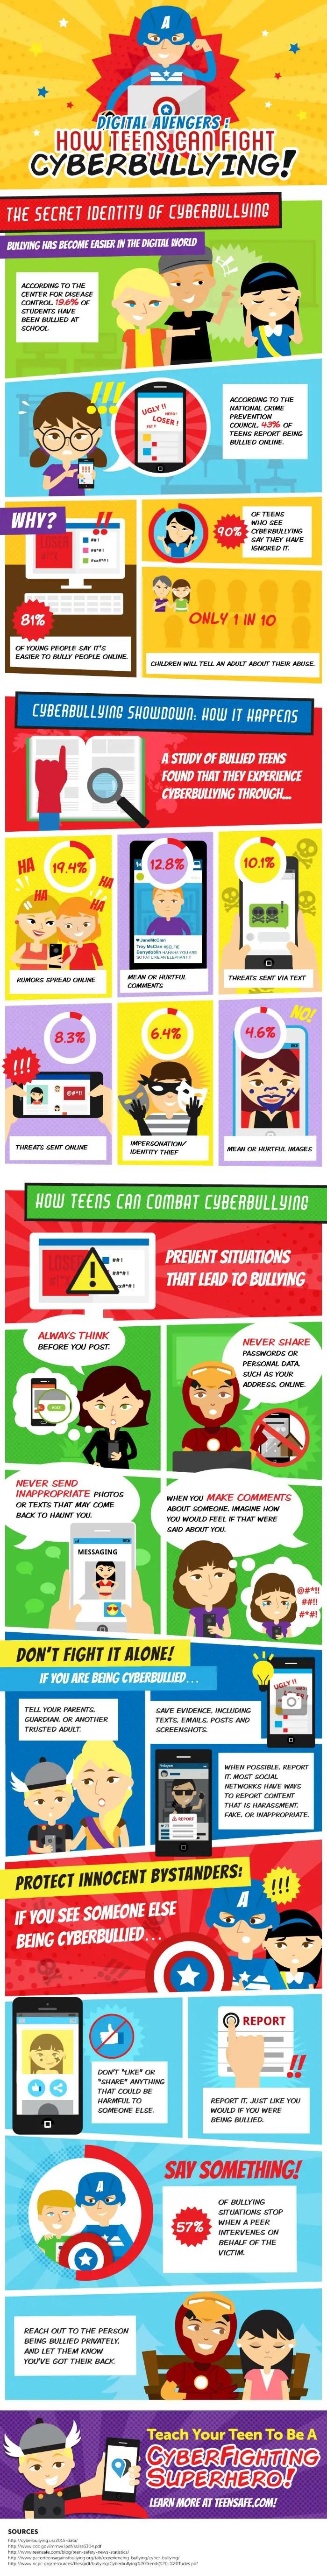 Digital Avengers Teens Fight Cyberbullies